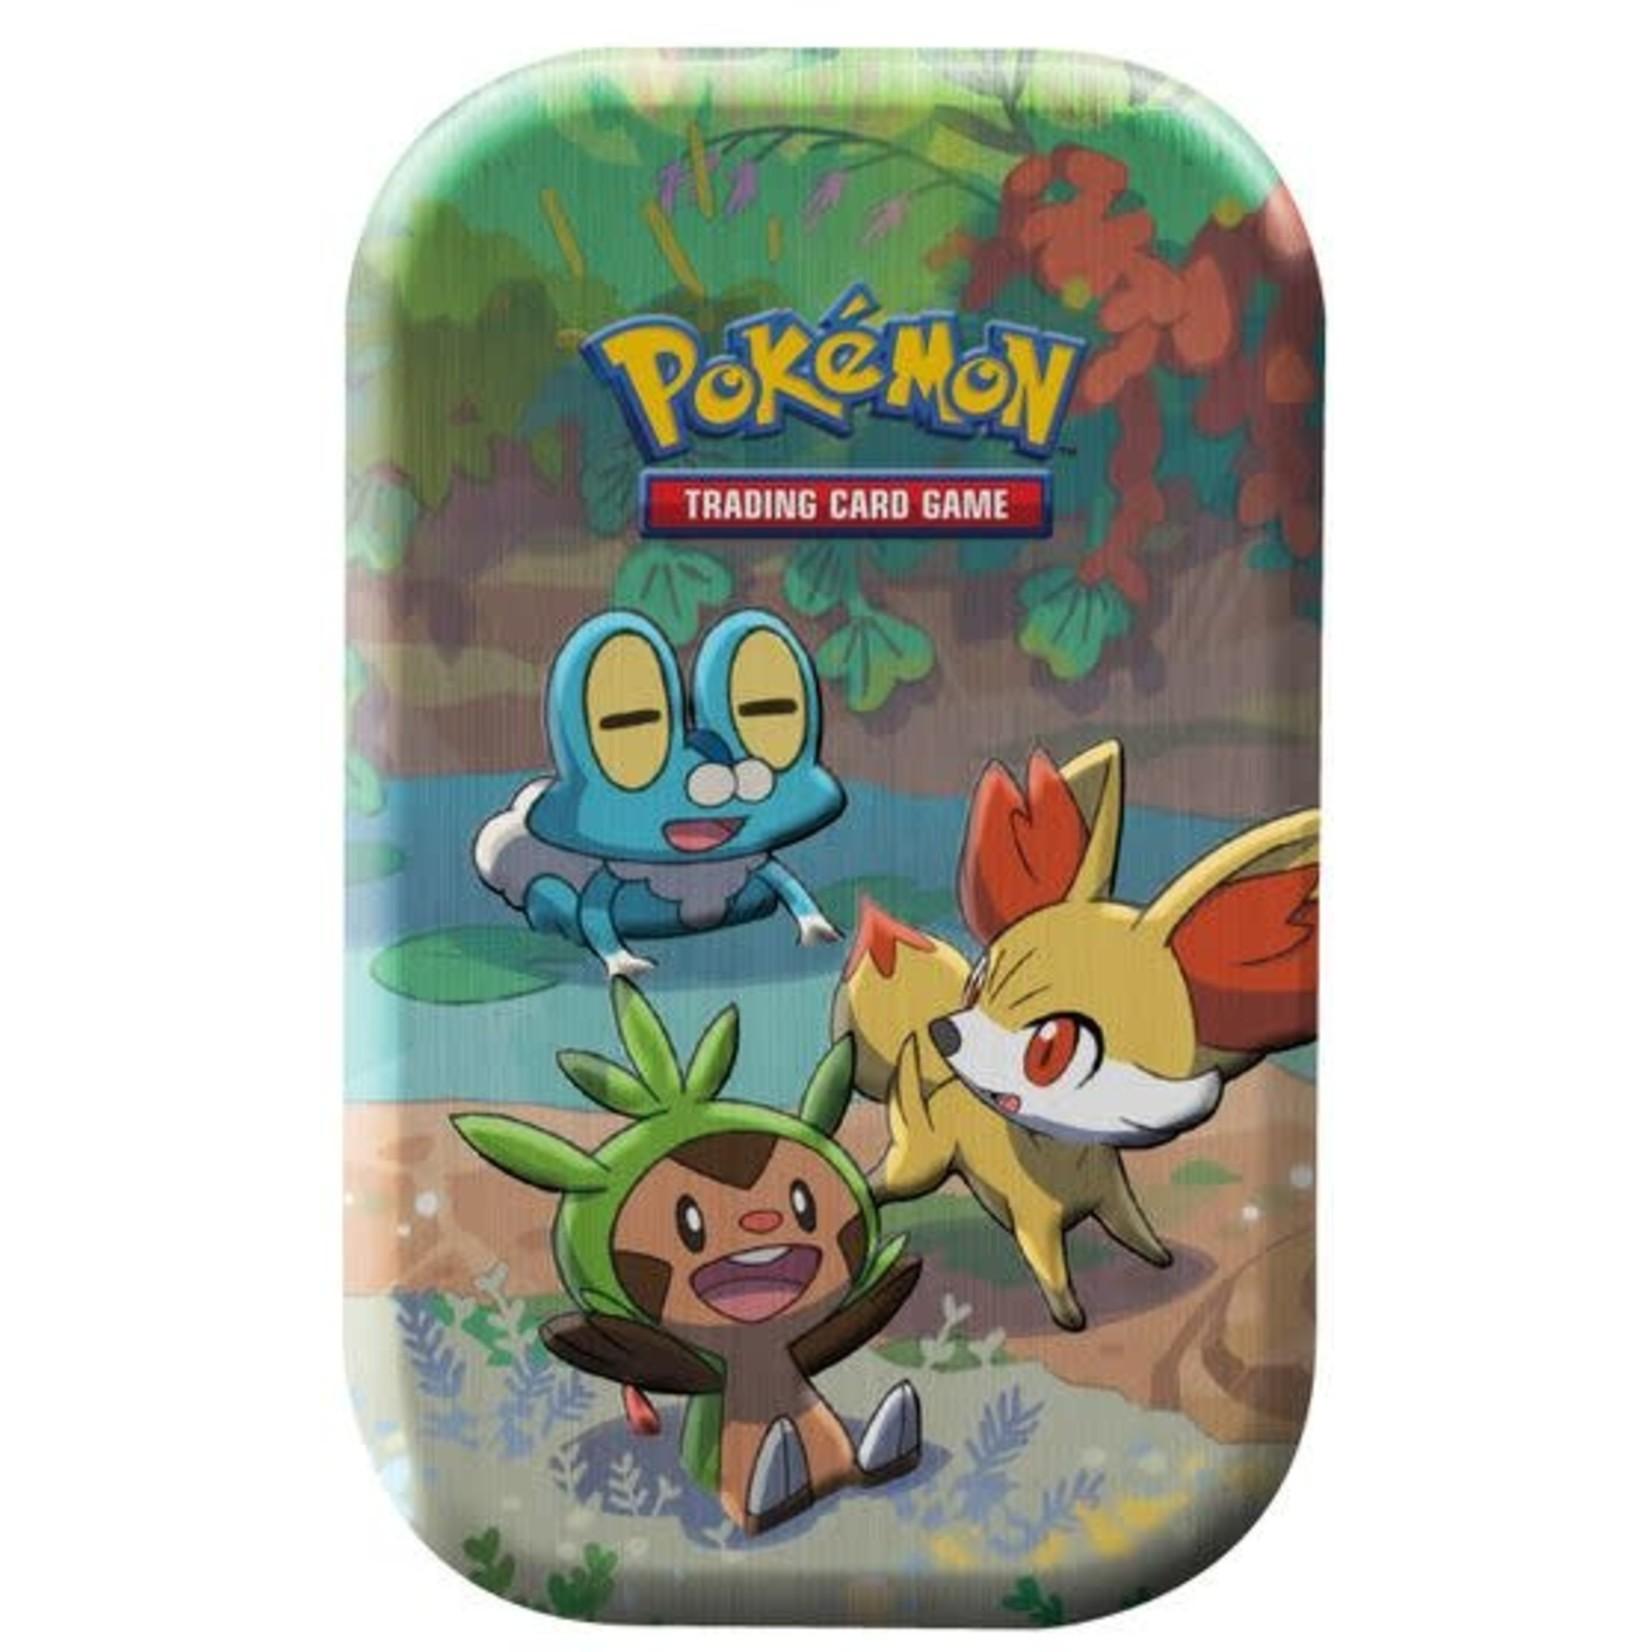 Pokemon International Pokemon Trading Card Game: Celebrations Mini Tin